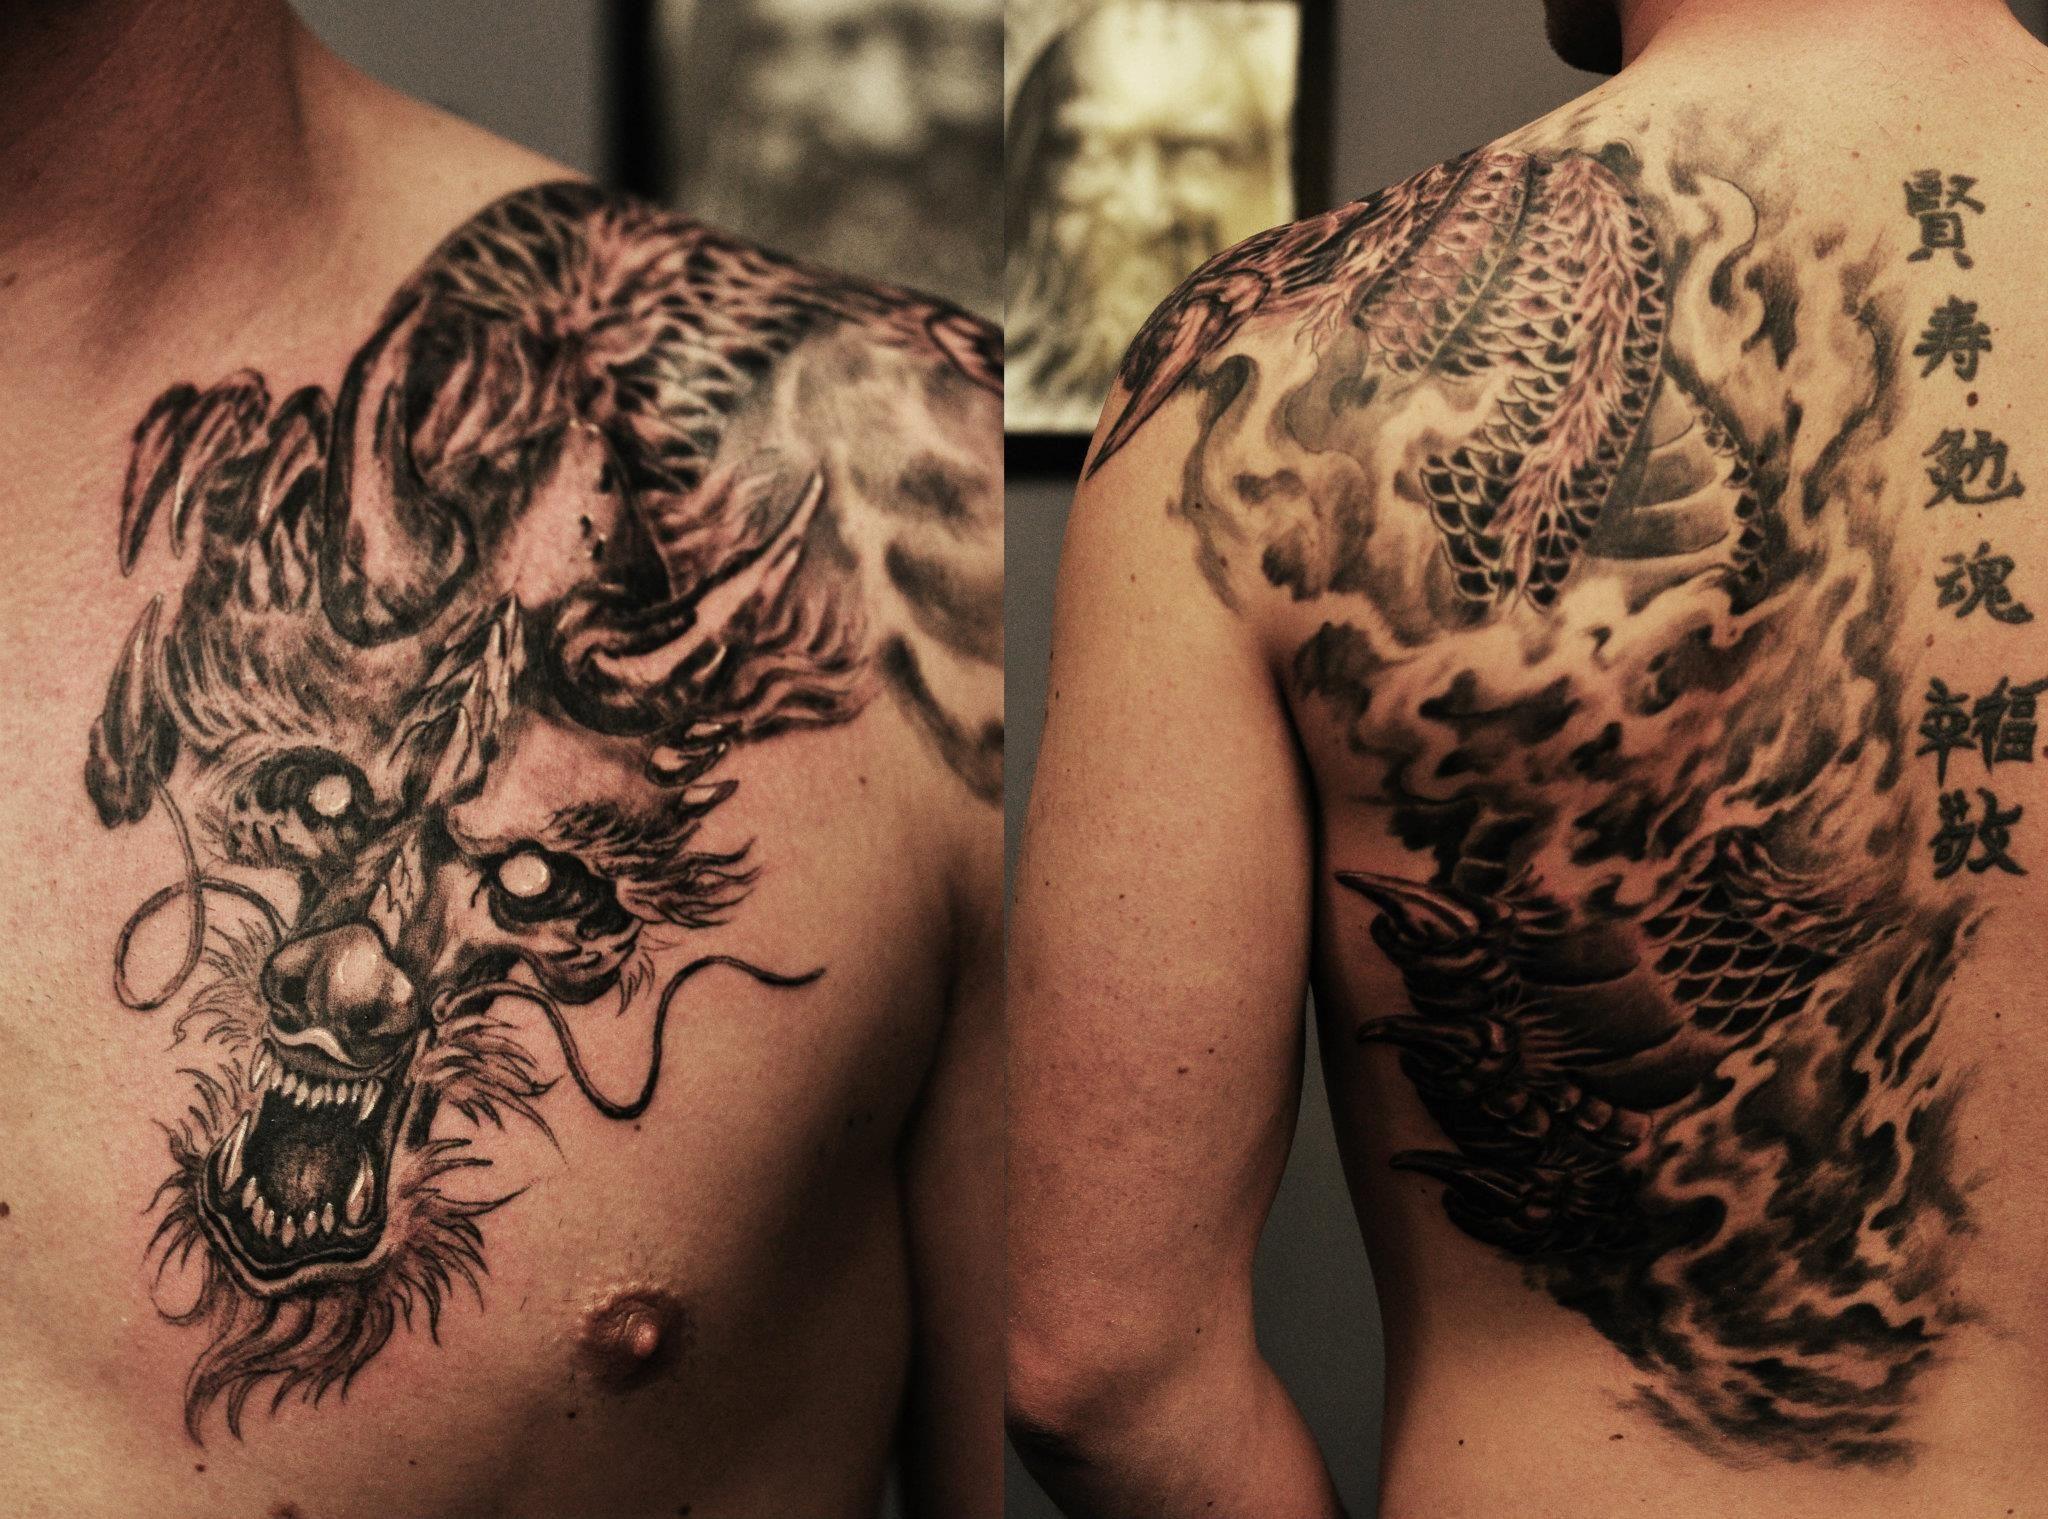 Chronic Ink Tattoos, Toronto Tattoo